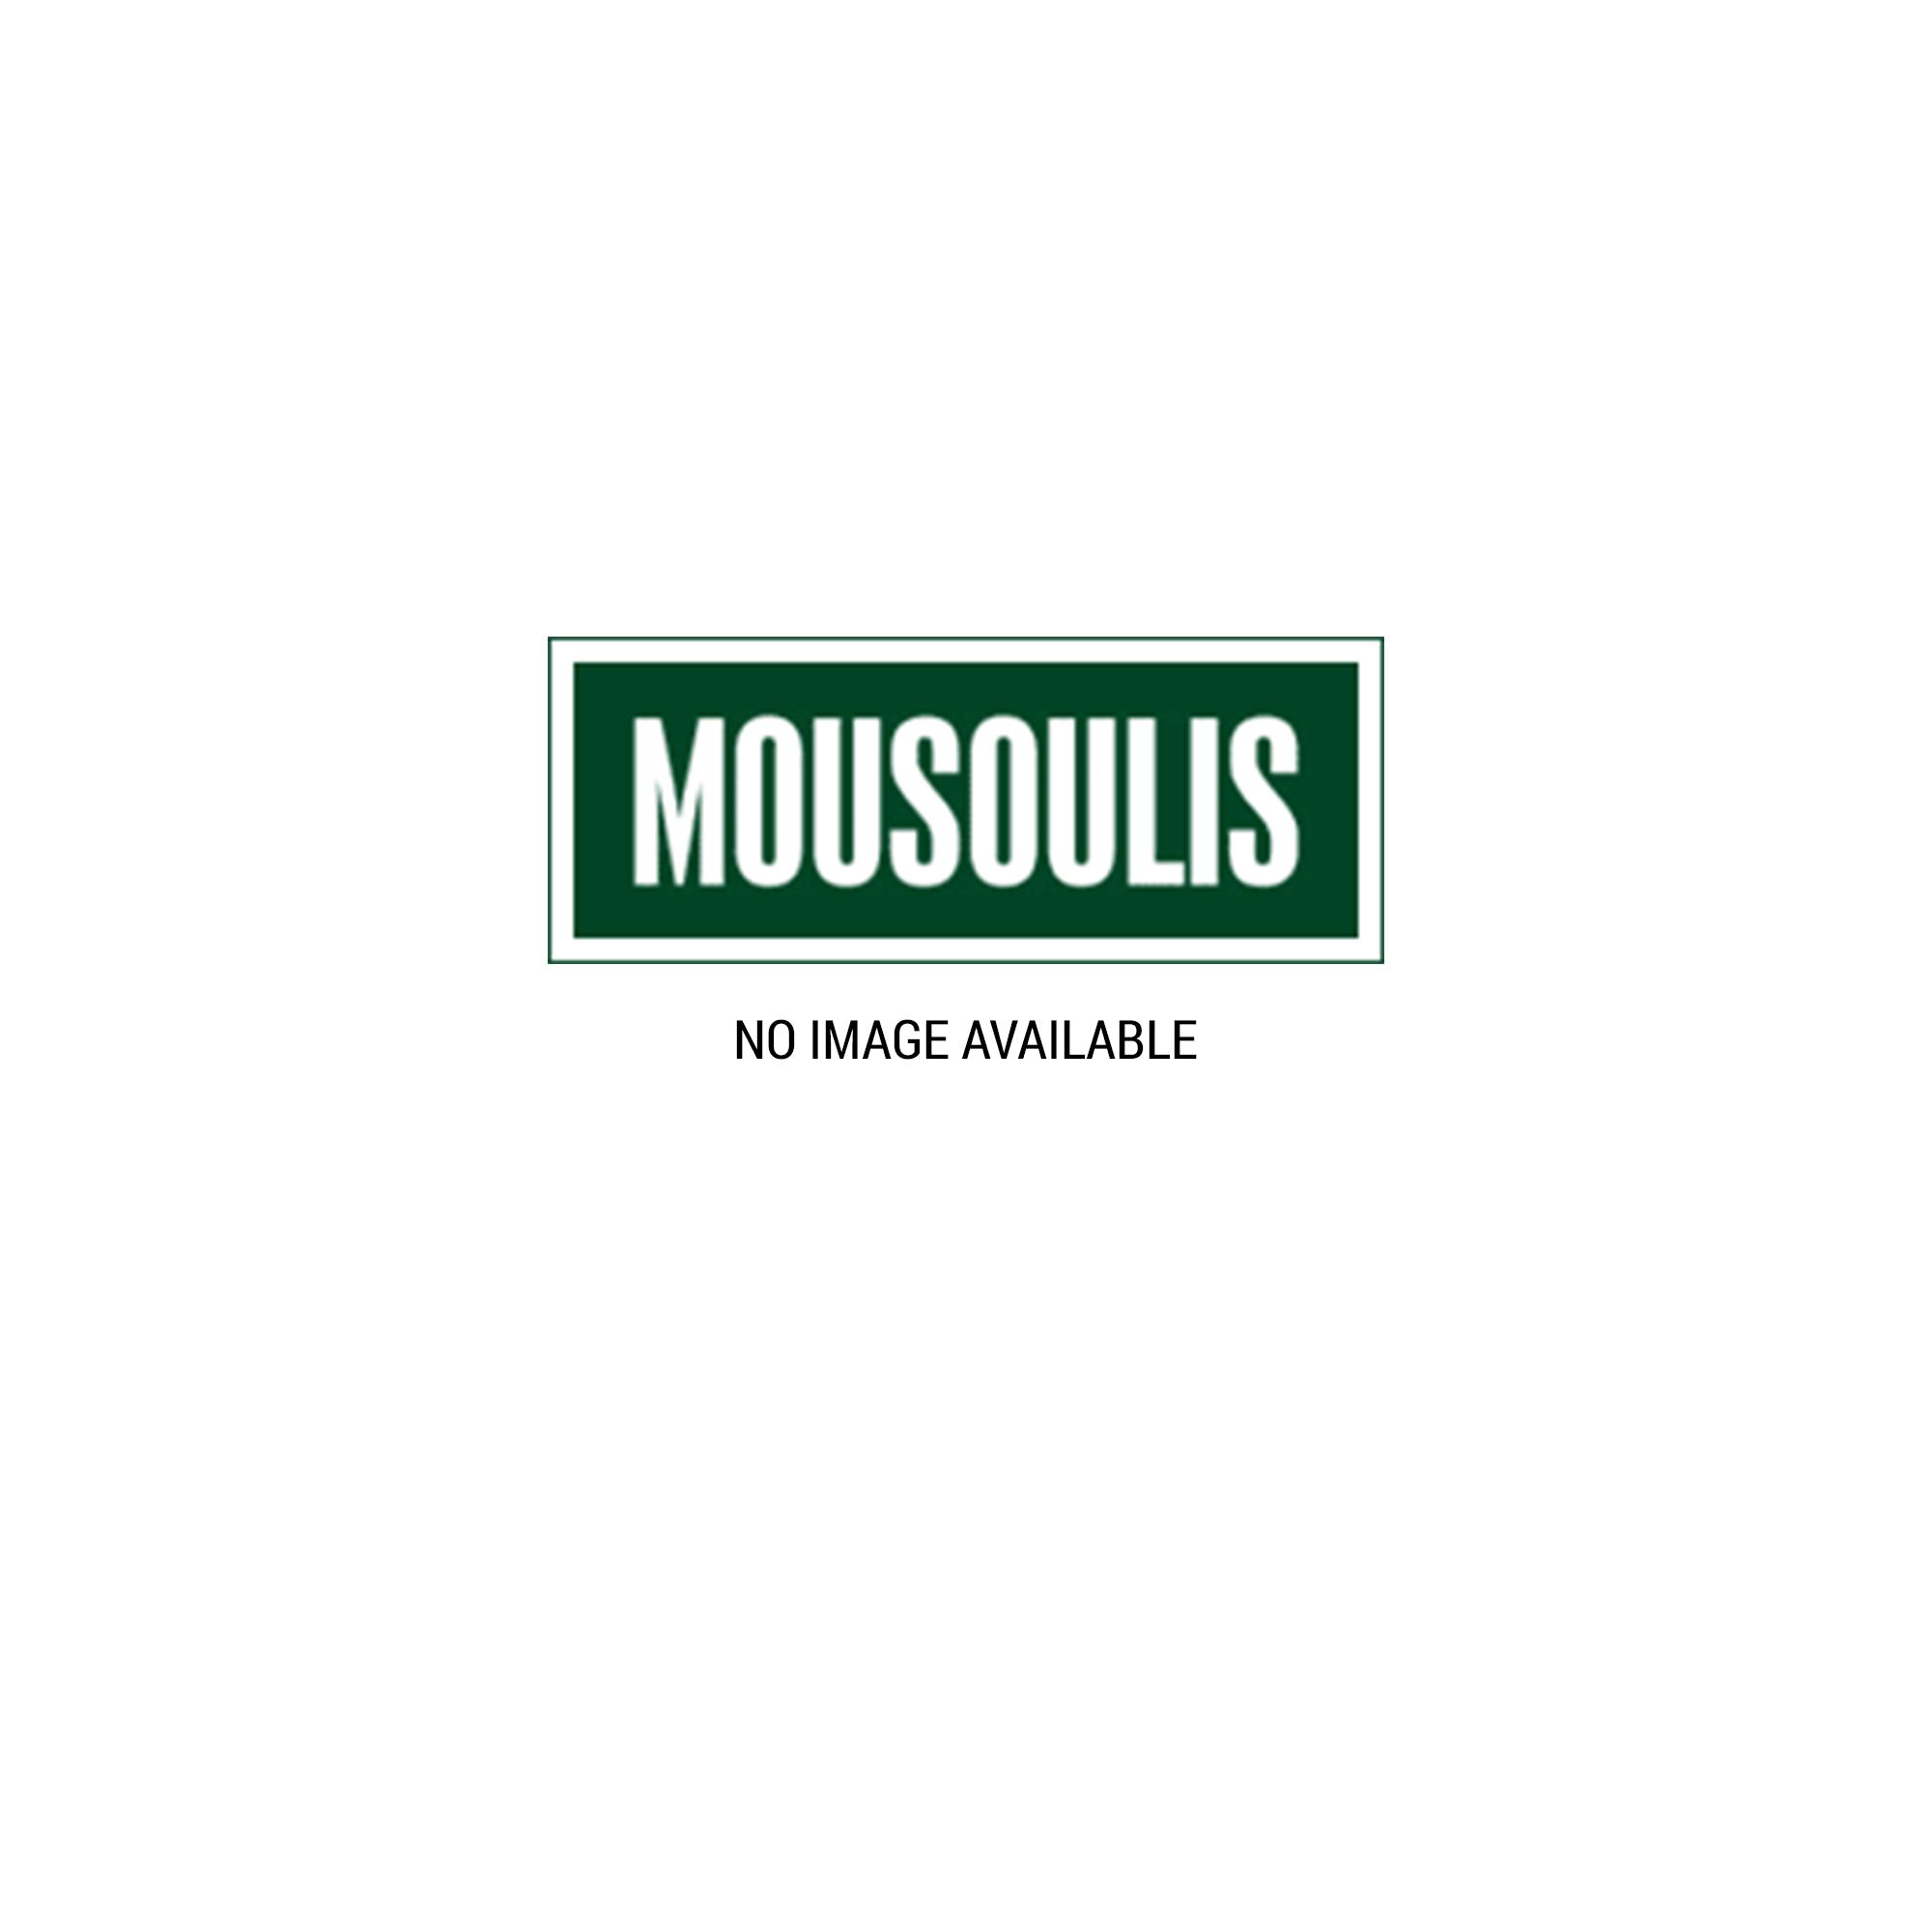 Barbour Lifestyle Κουκούλα Κερωμένη Αδιάβροχη με Καρό Διχρωμίες MHO0004 Πράσινο